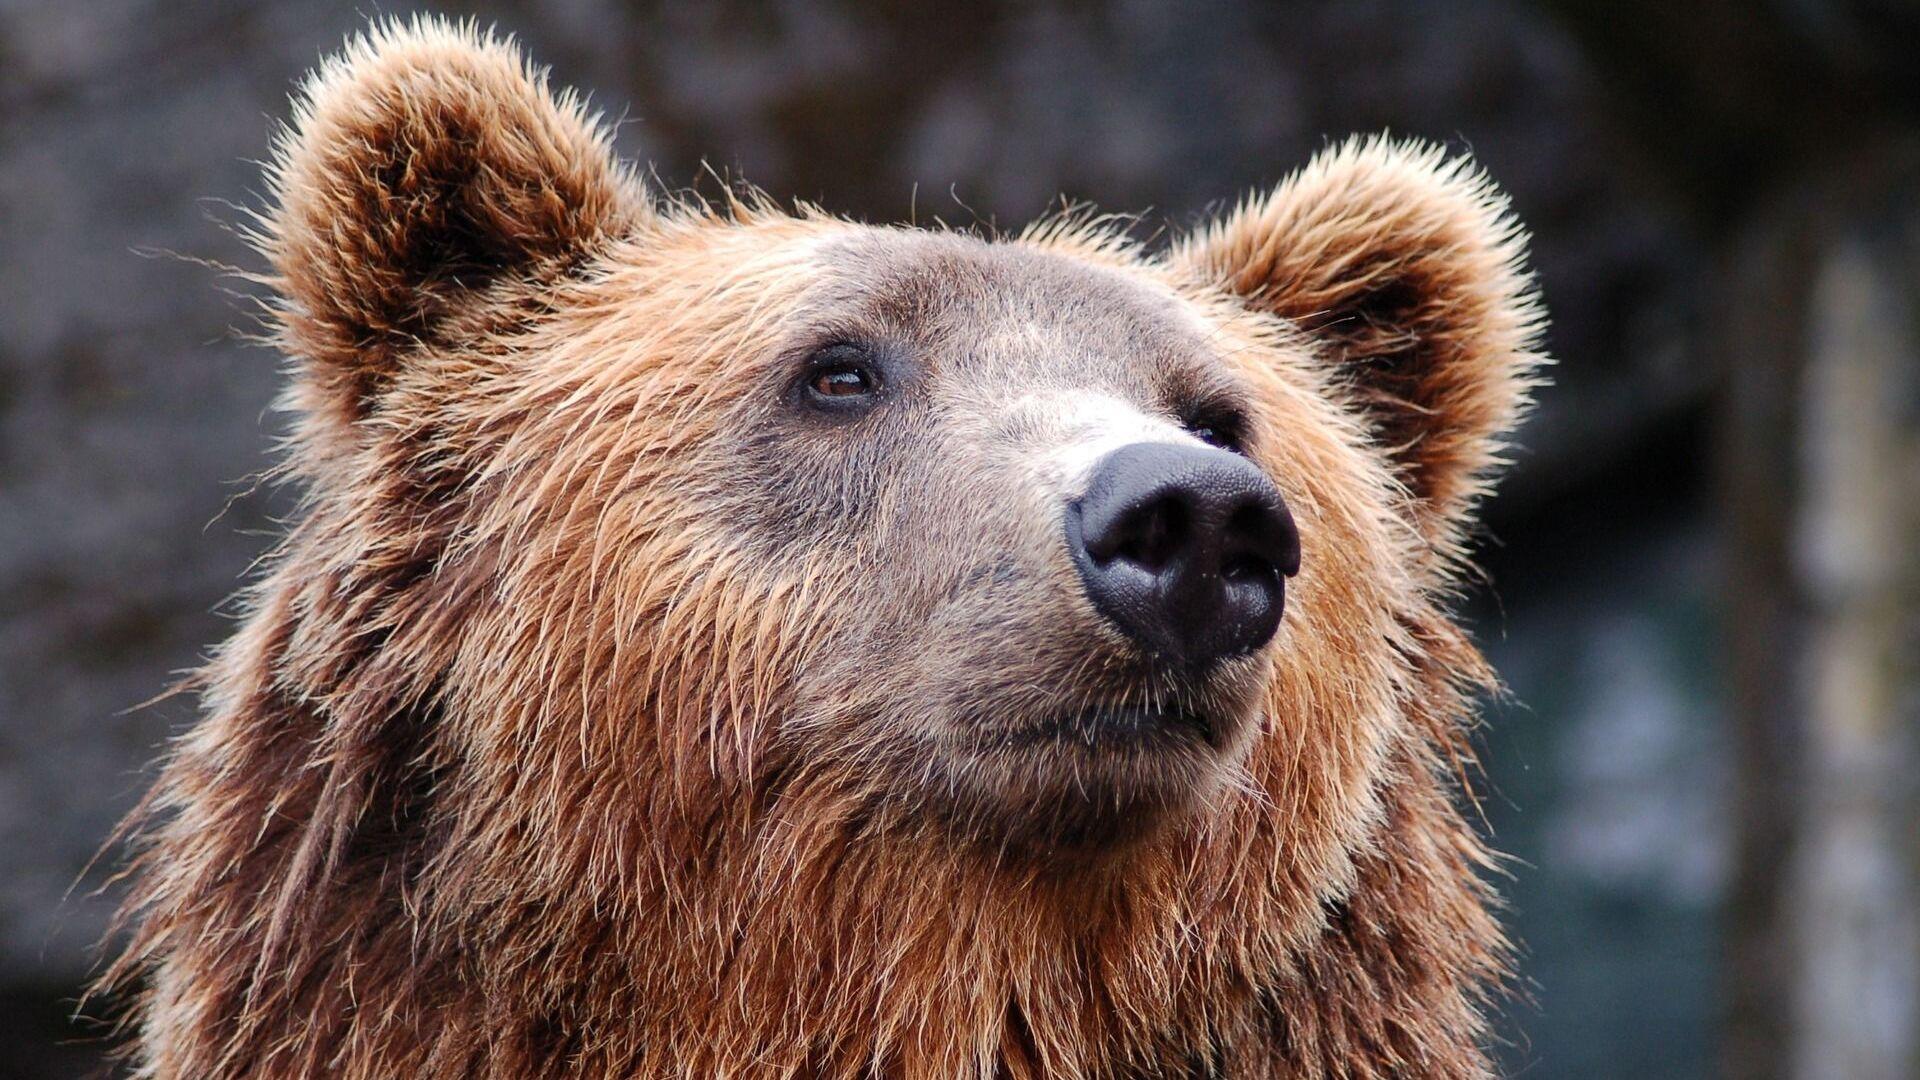 Un oso (archivo) - Sputnik Mundo, 1920, 18.03.2021